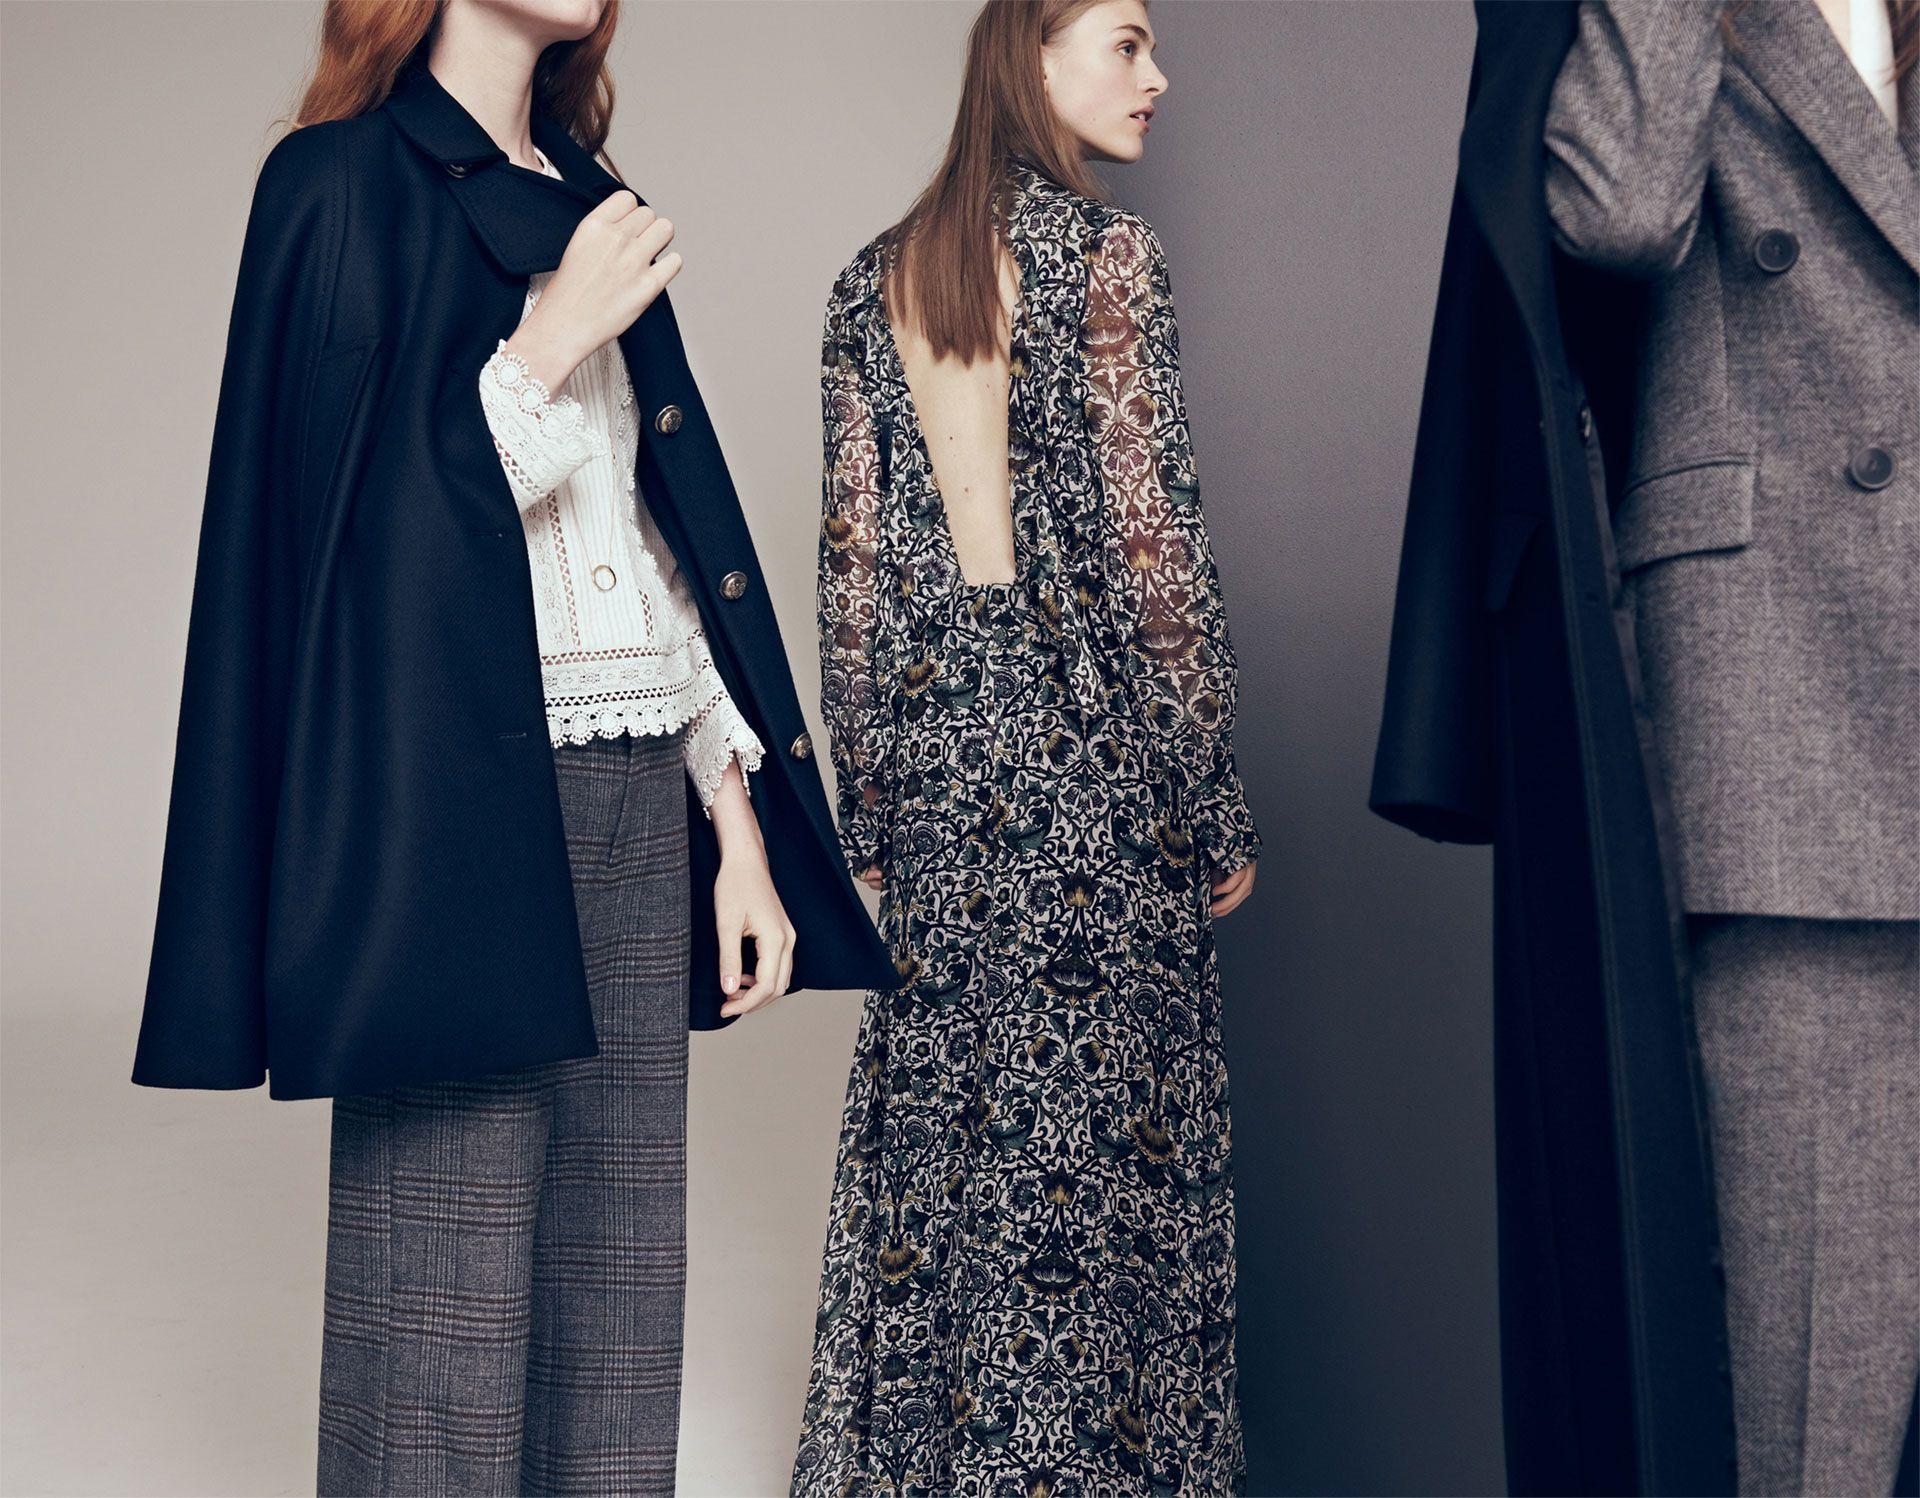 Zara's Fall 2015 Trend Report